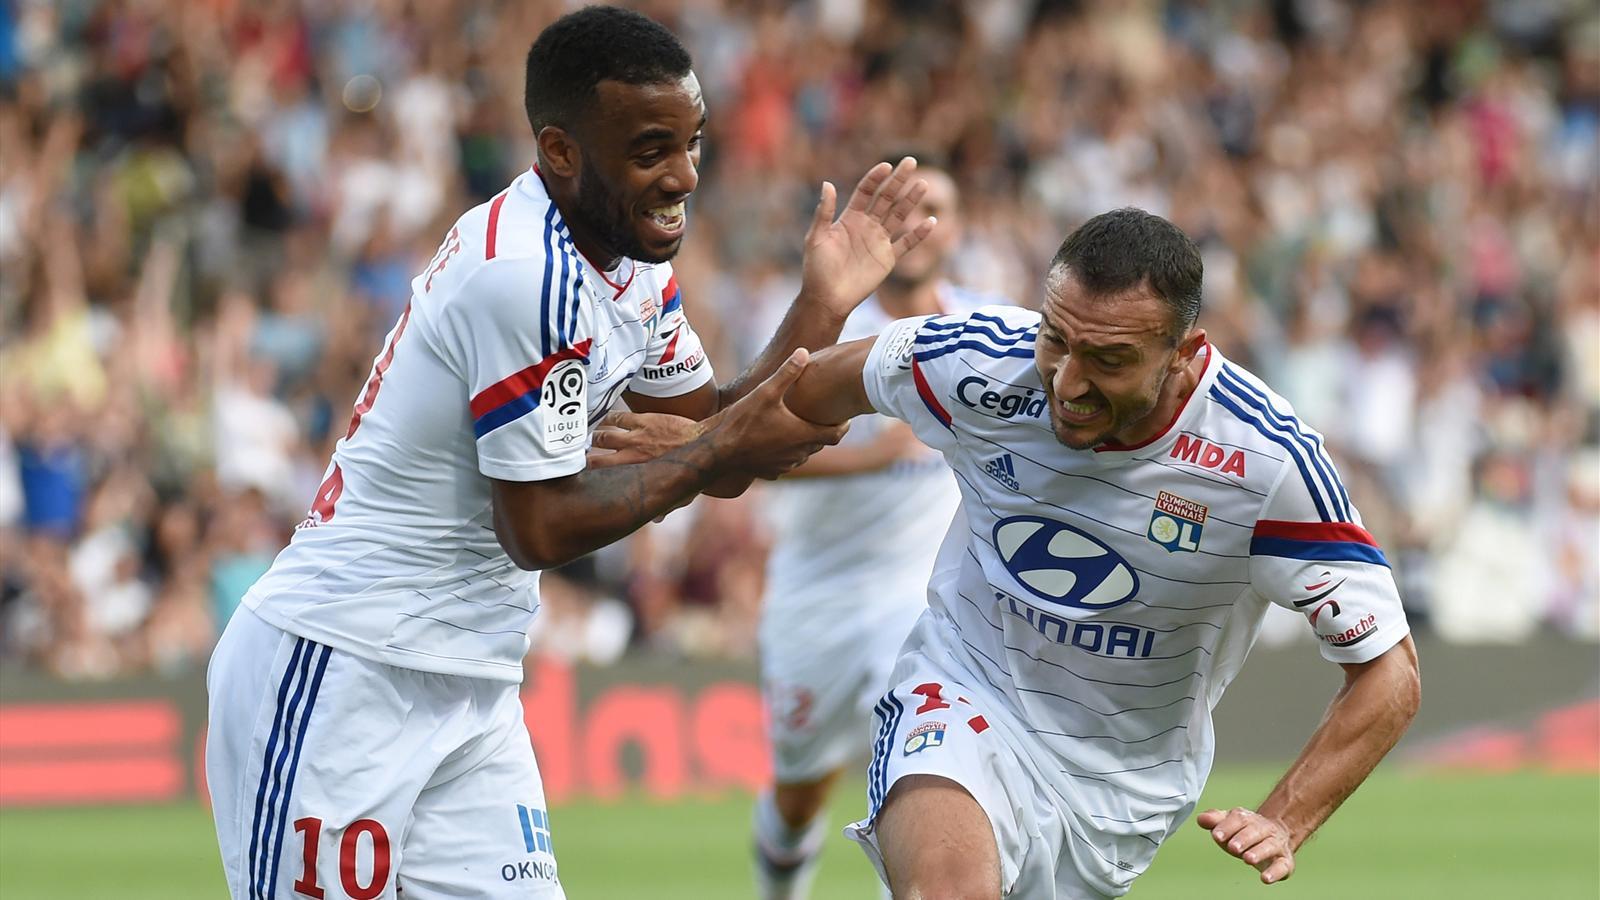 Match OGC Nice vs Olympique Lyonnais en direct live streaming